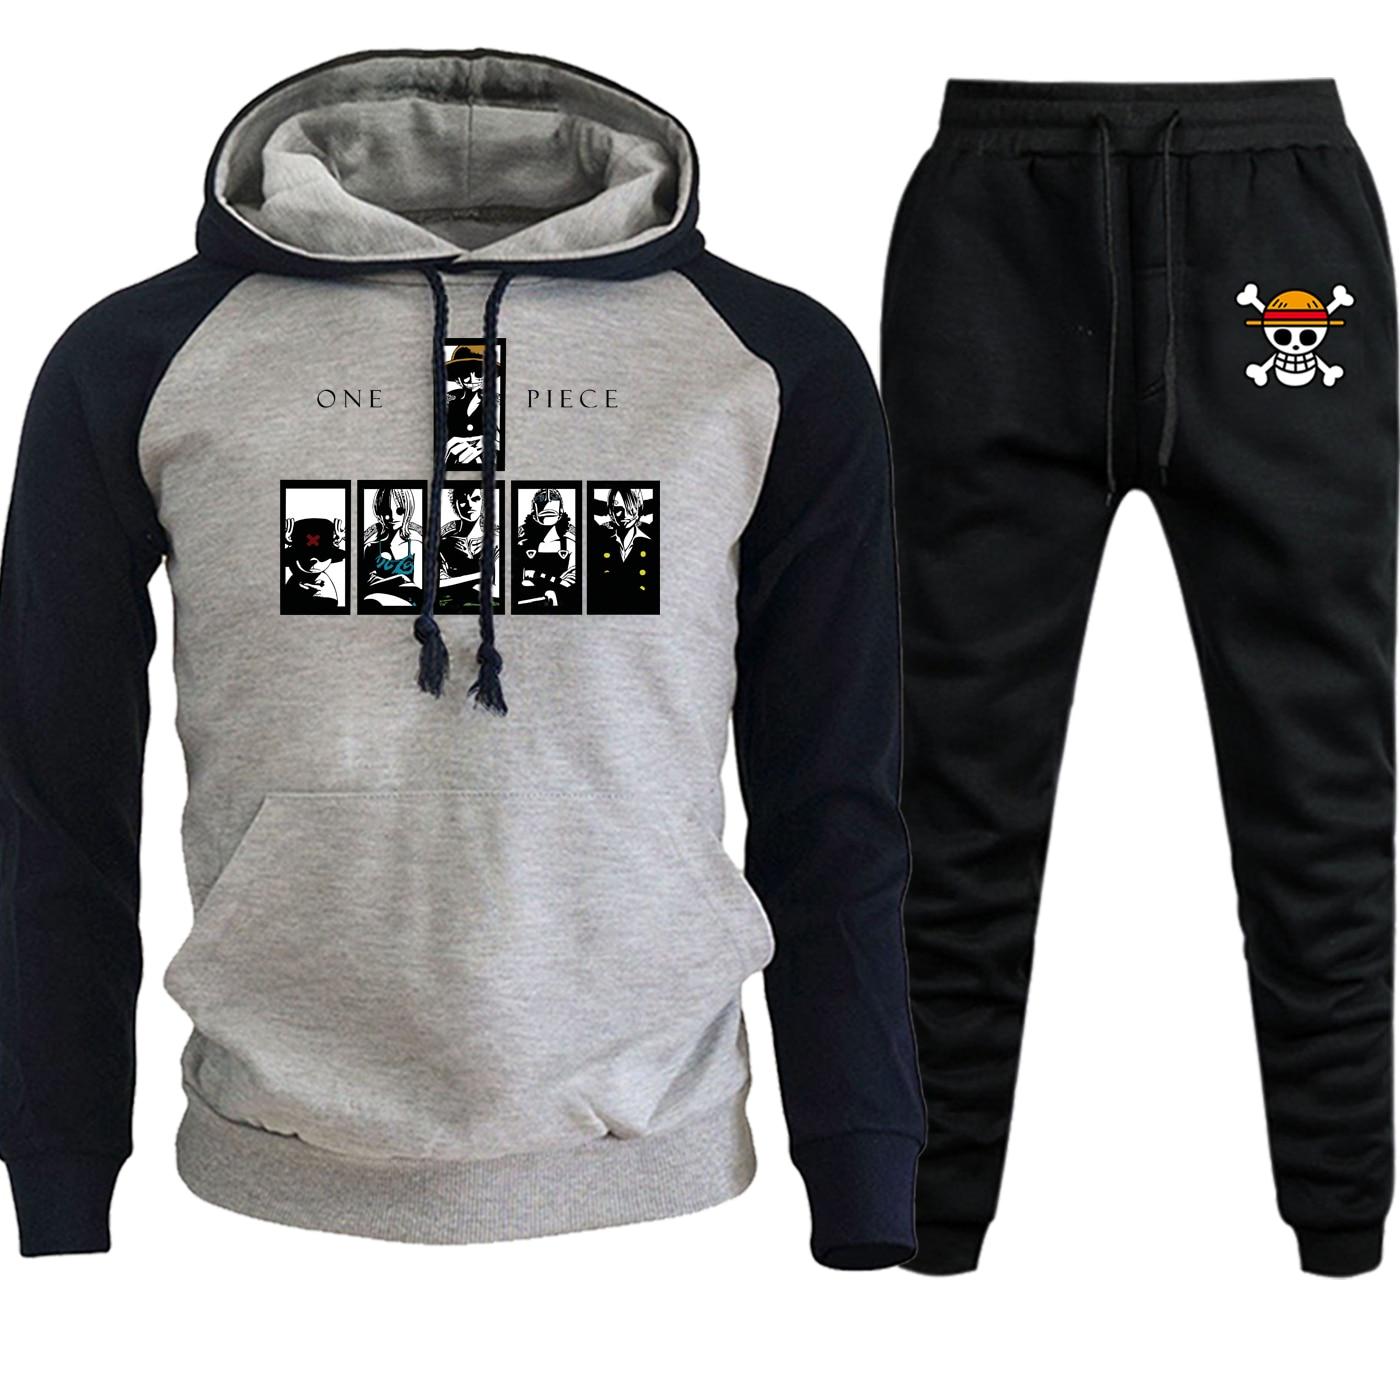 Cartoon Hoodies Men Raglan Sportswear One Piece Japan Anime New Autumn Winter 2019 Suit Hip Hop Fleece Hooded+Pants 2 Piece Set